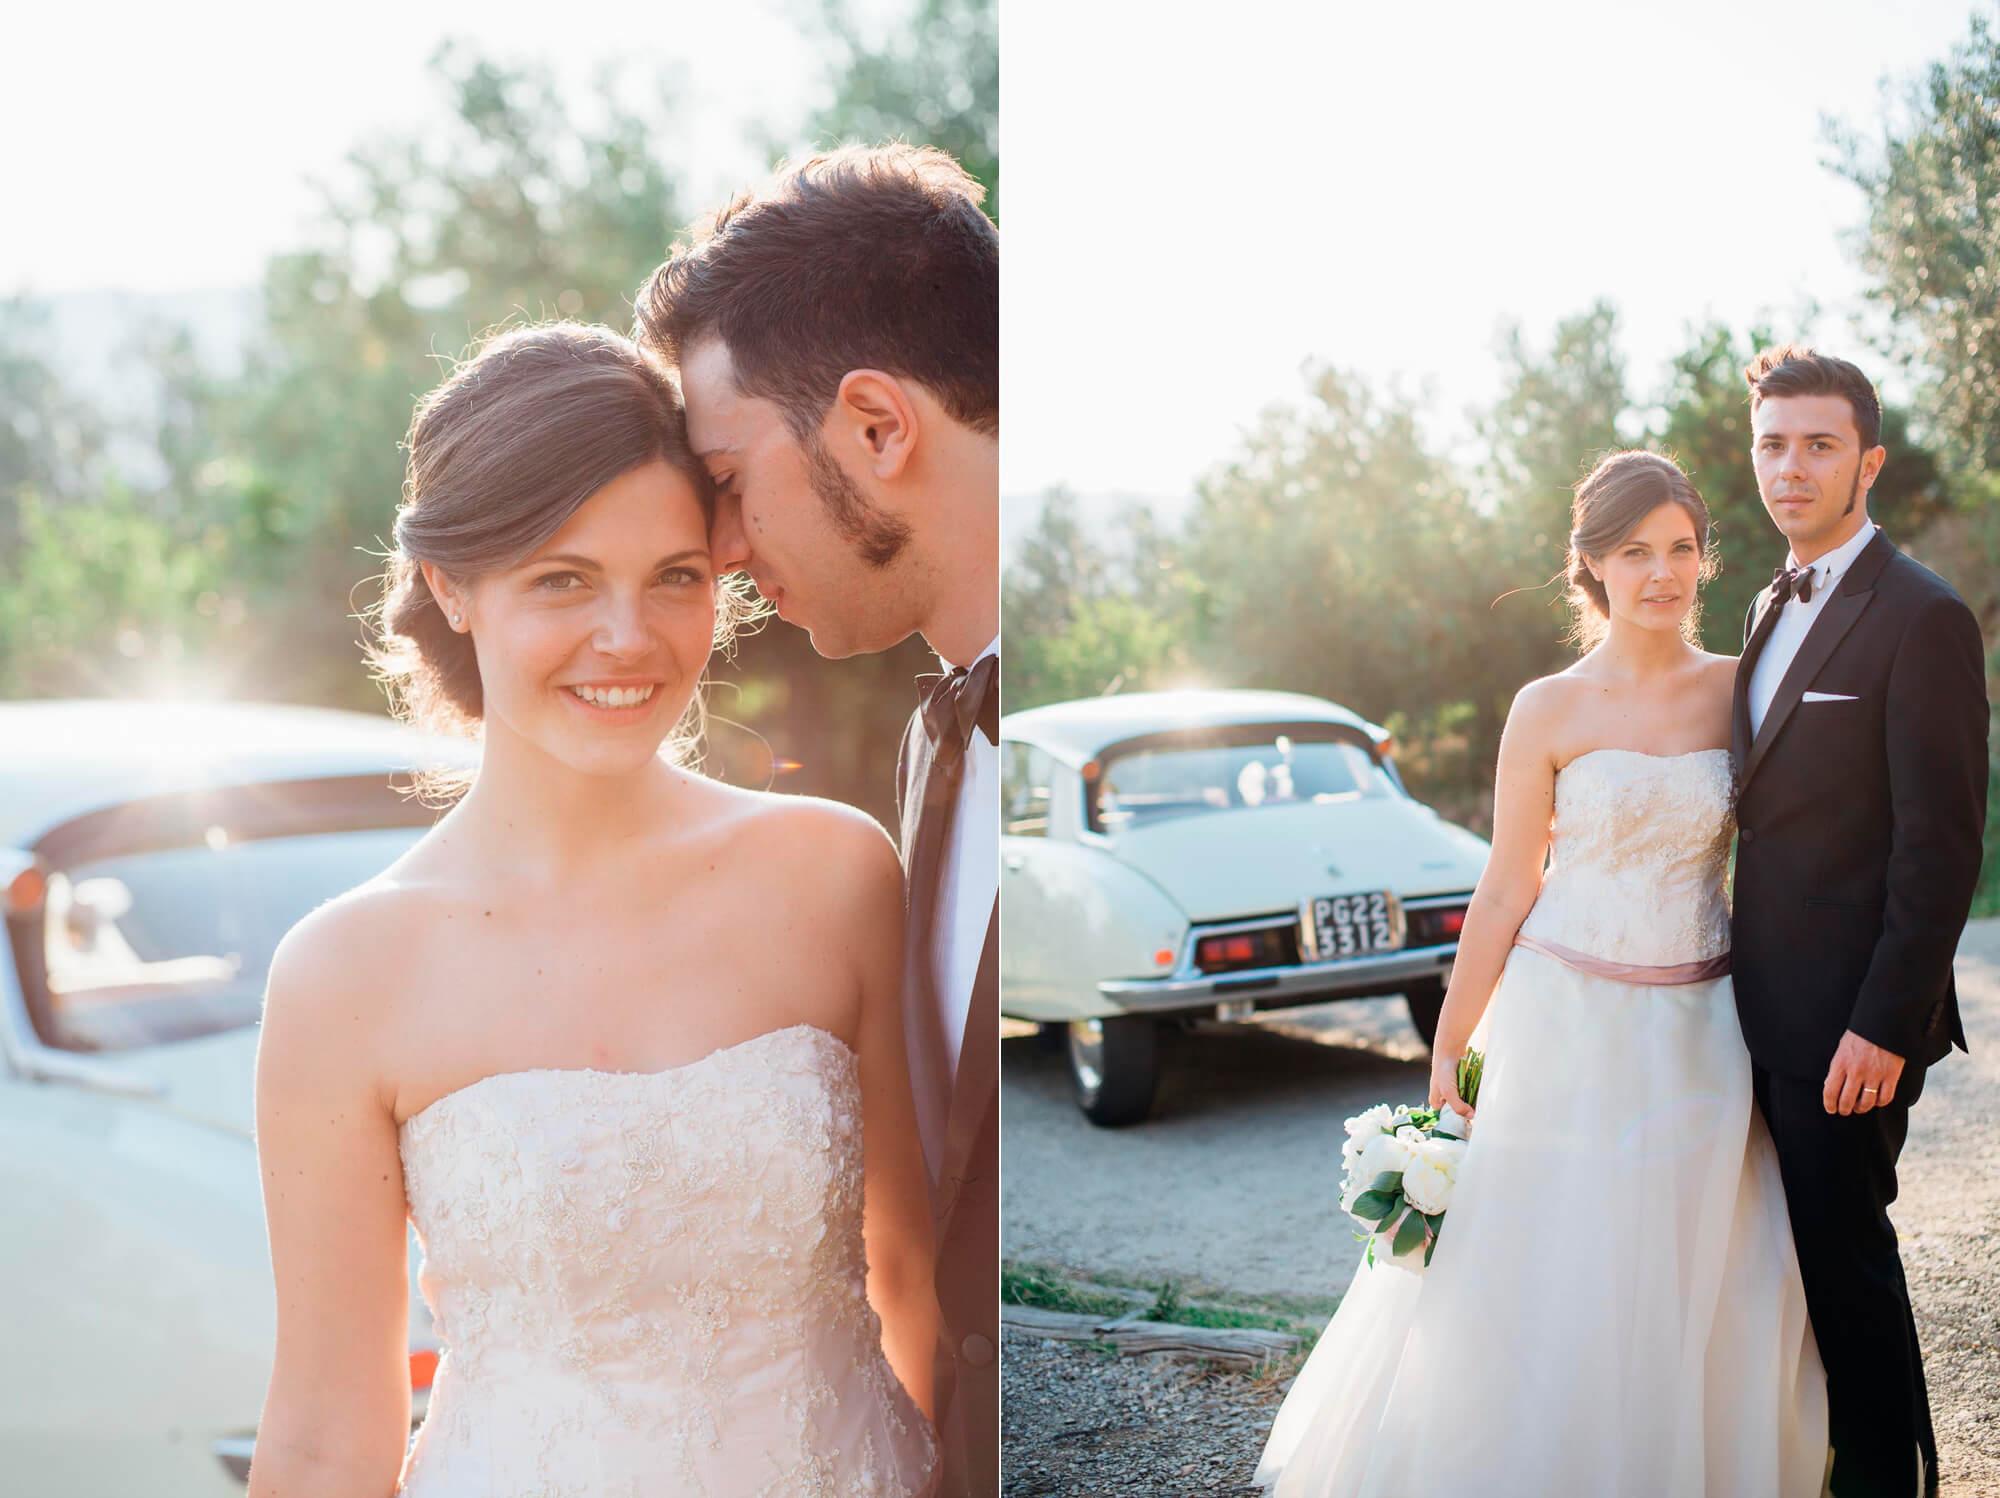 083-arezzo-wedding-photographer.jpg